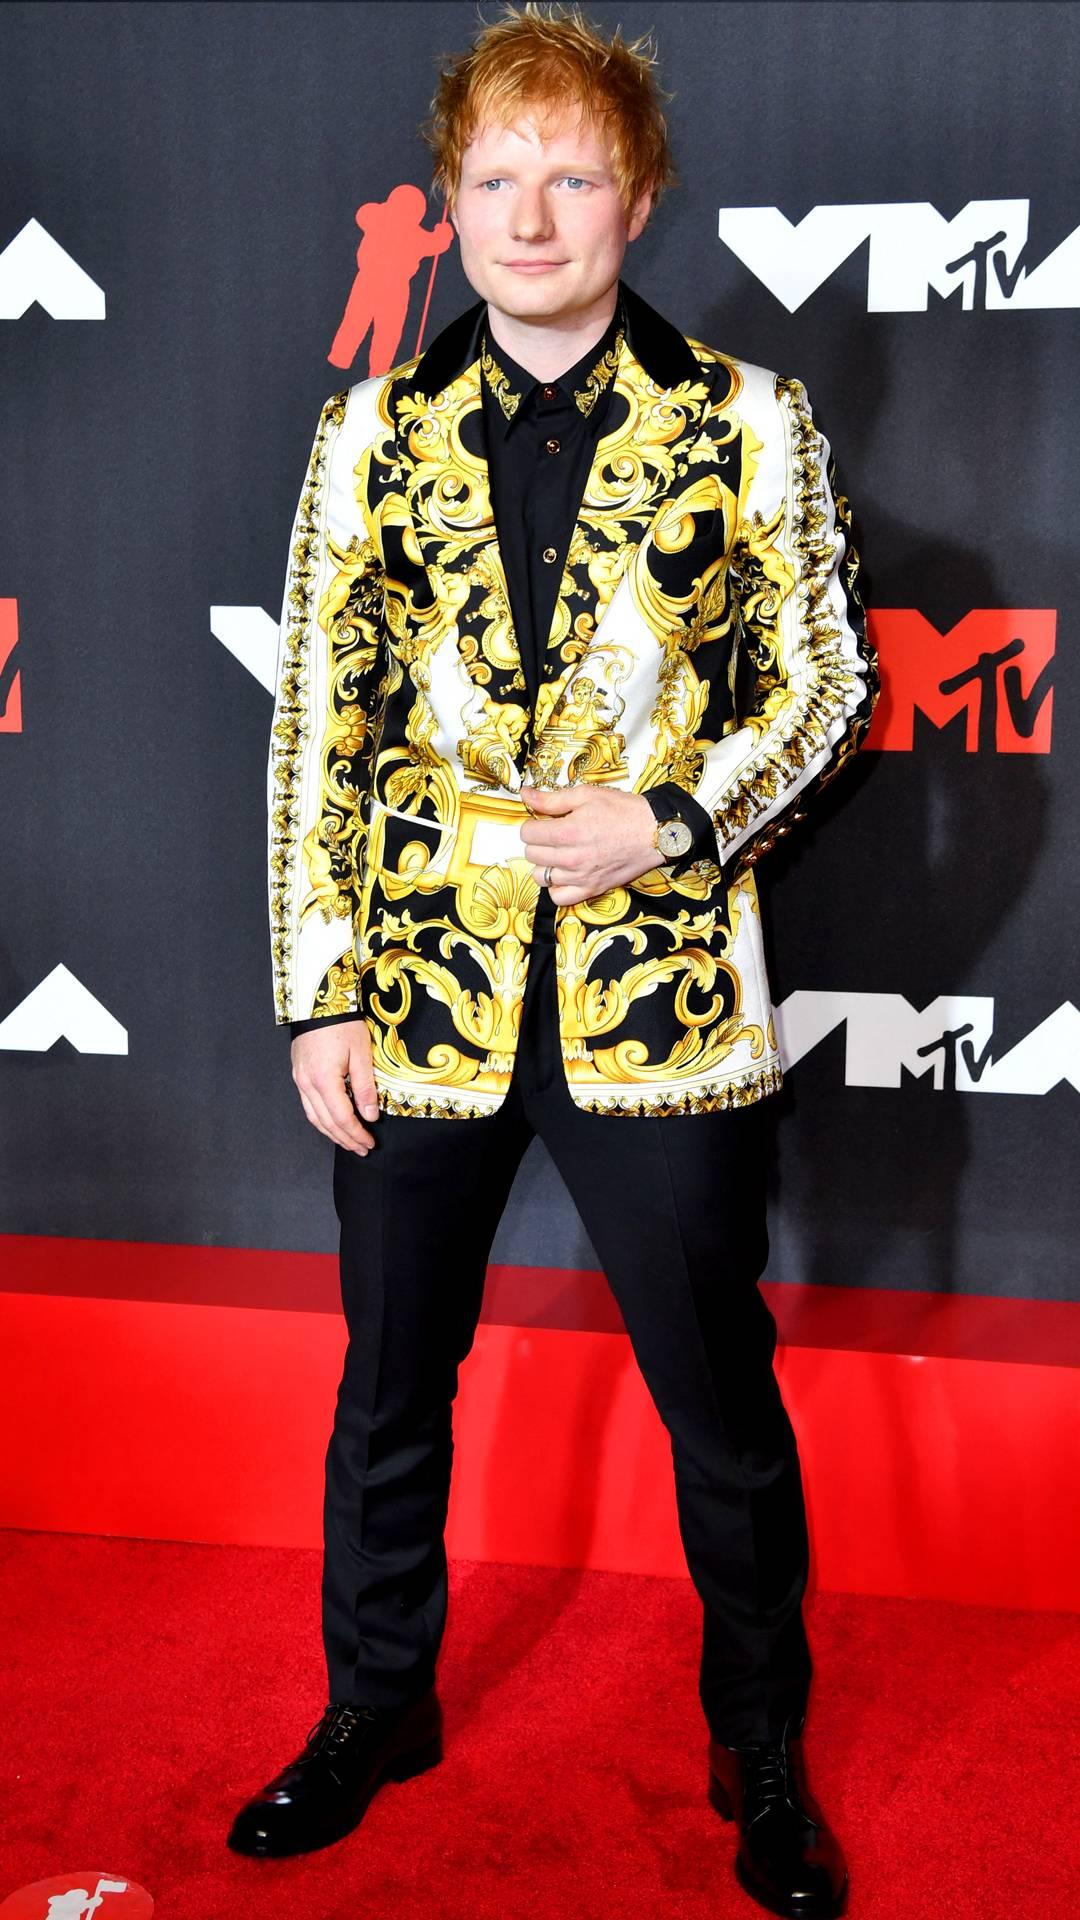 MTV Video Music Awards 2021 | The Best of the VMAs 2021 Red Carpet | Ed Sheeran | 1080x1920